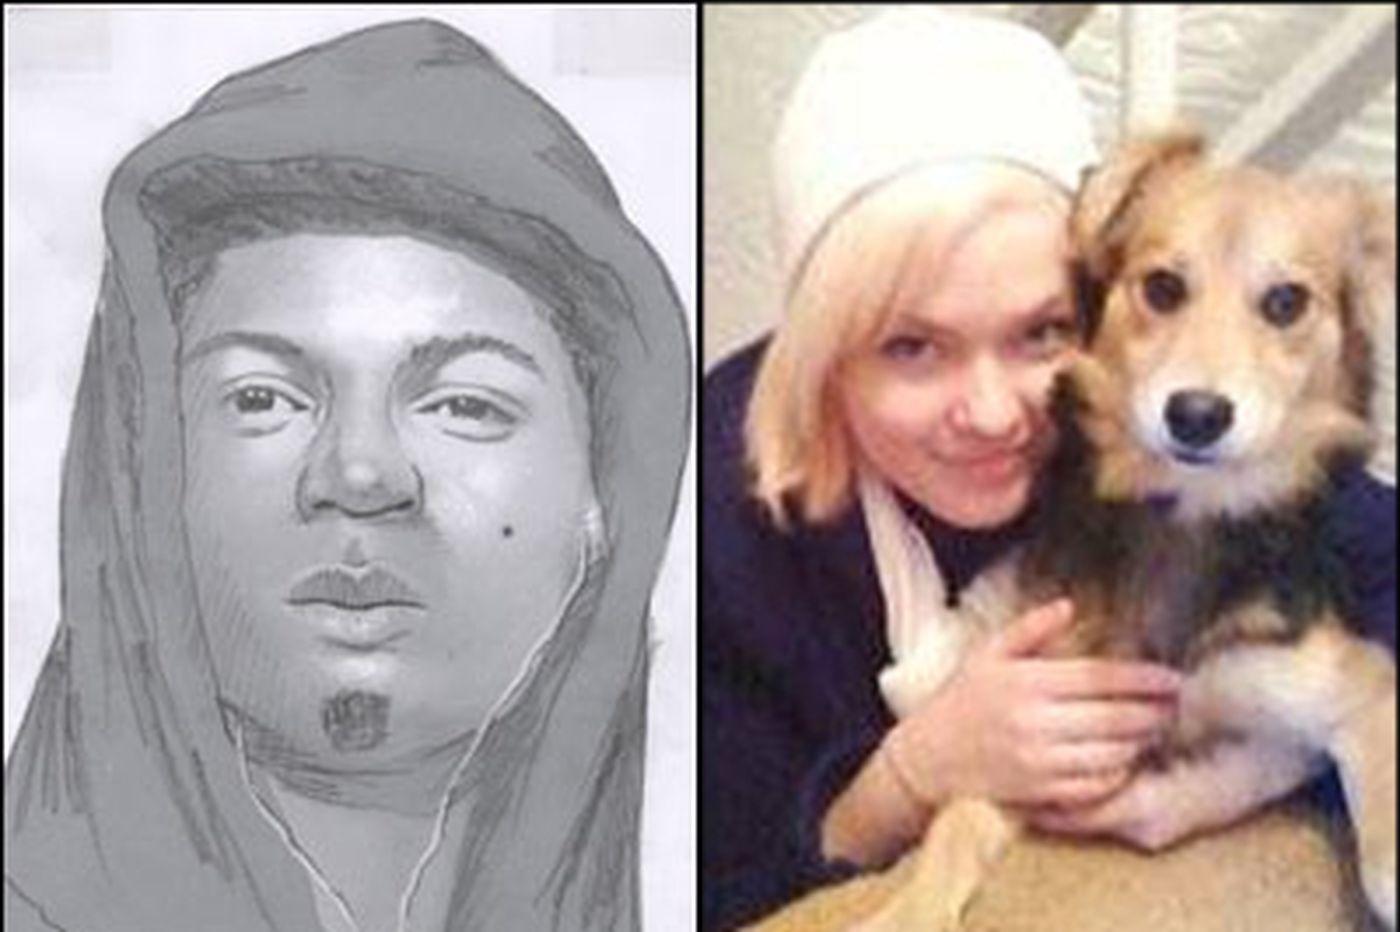 Strangulation victim's friend: 'She was a beautiful person'